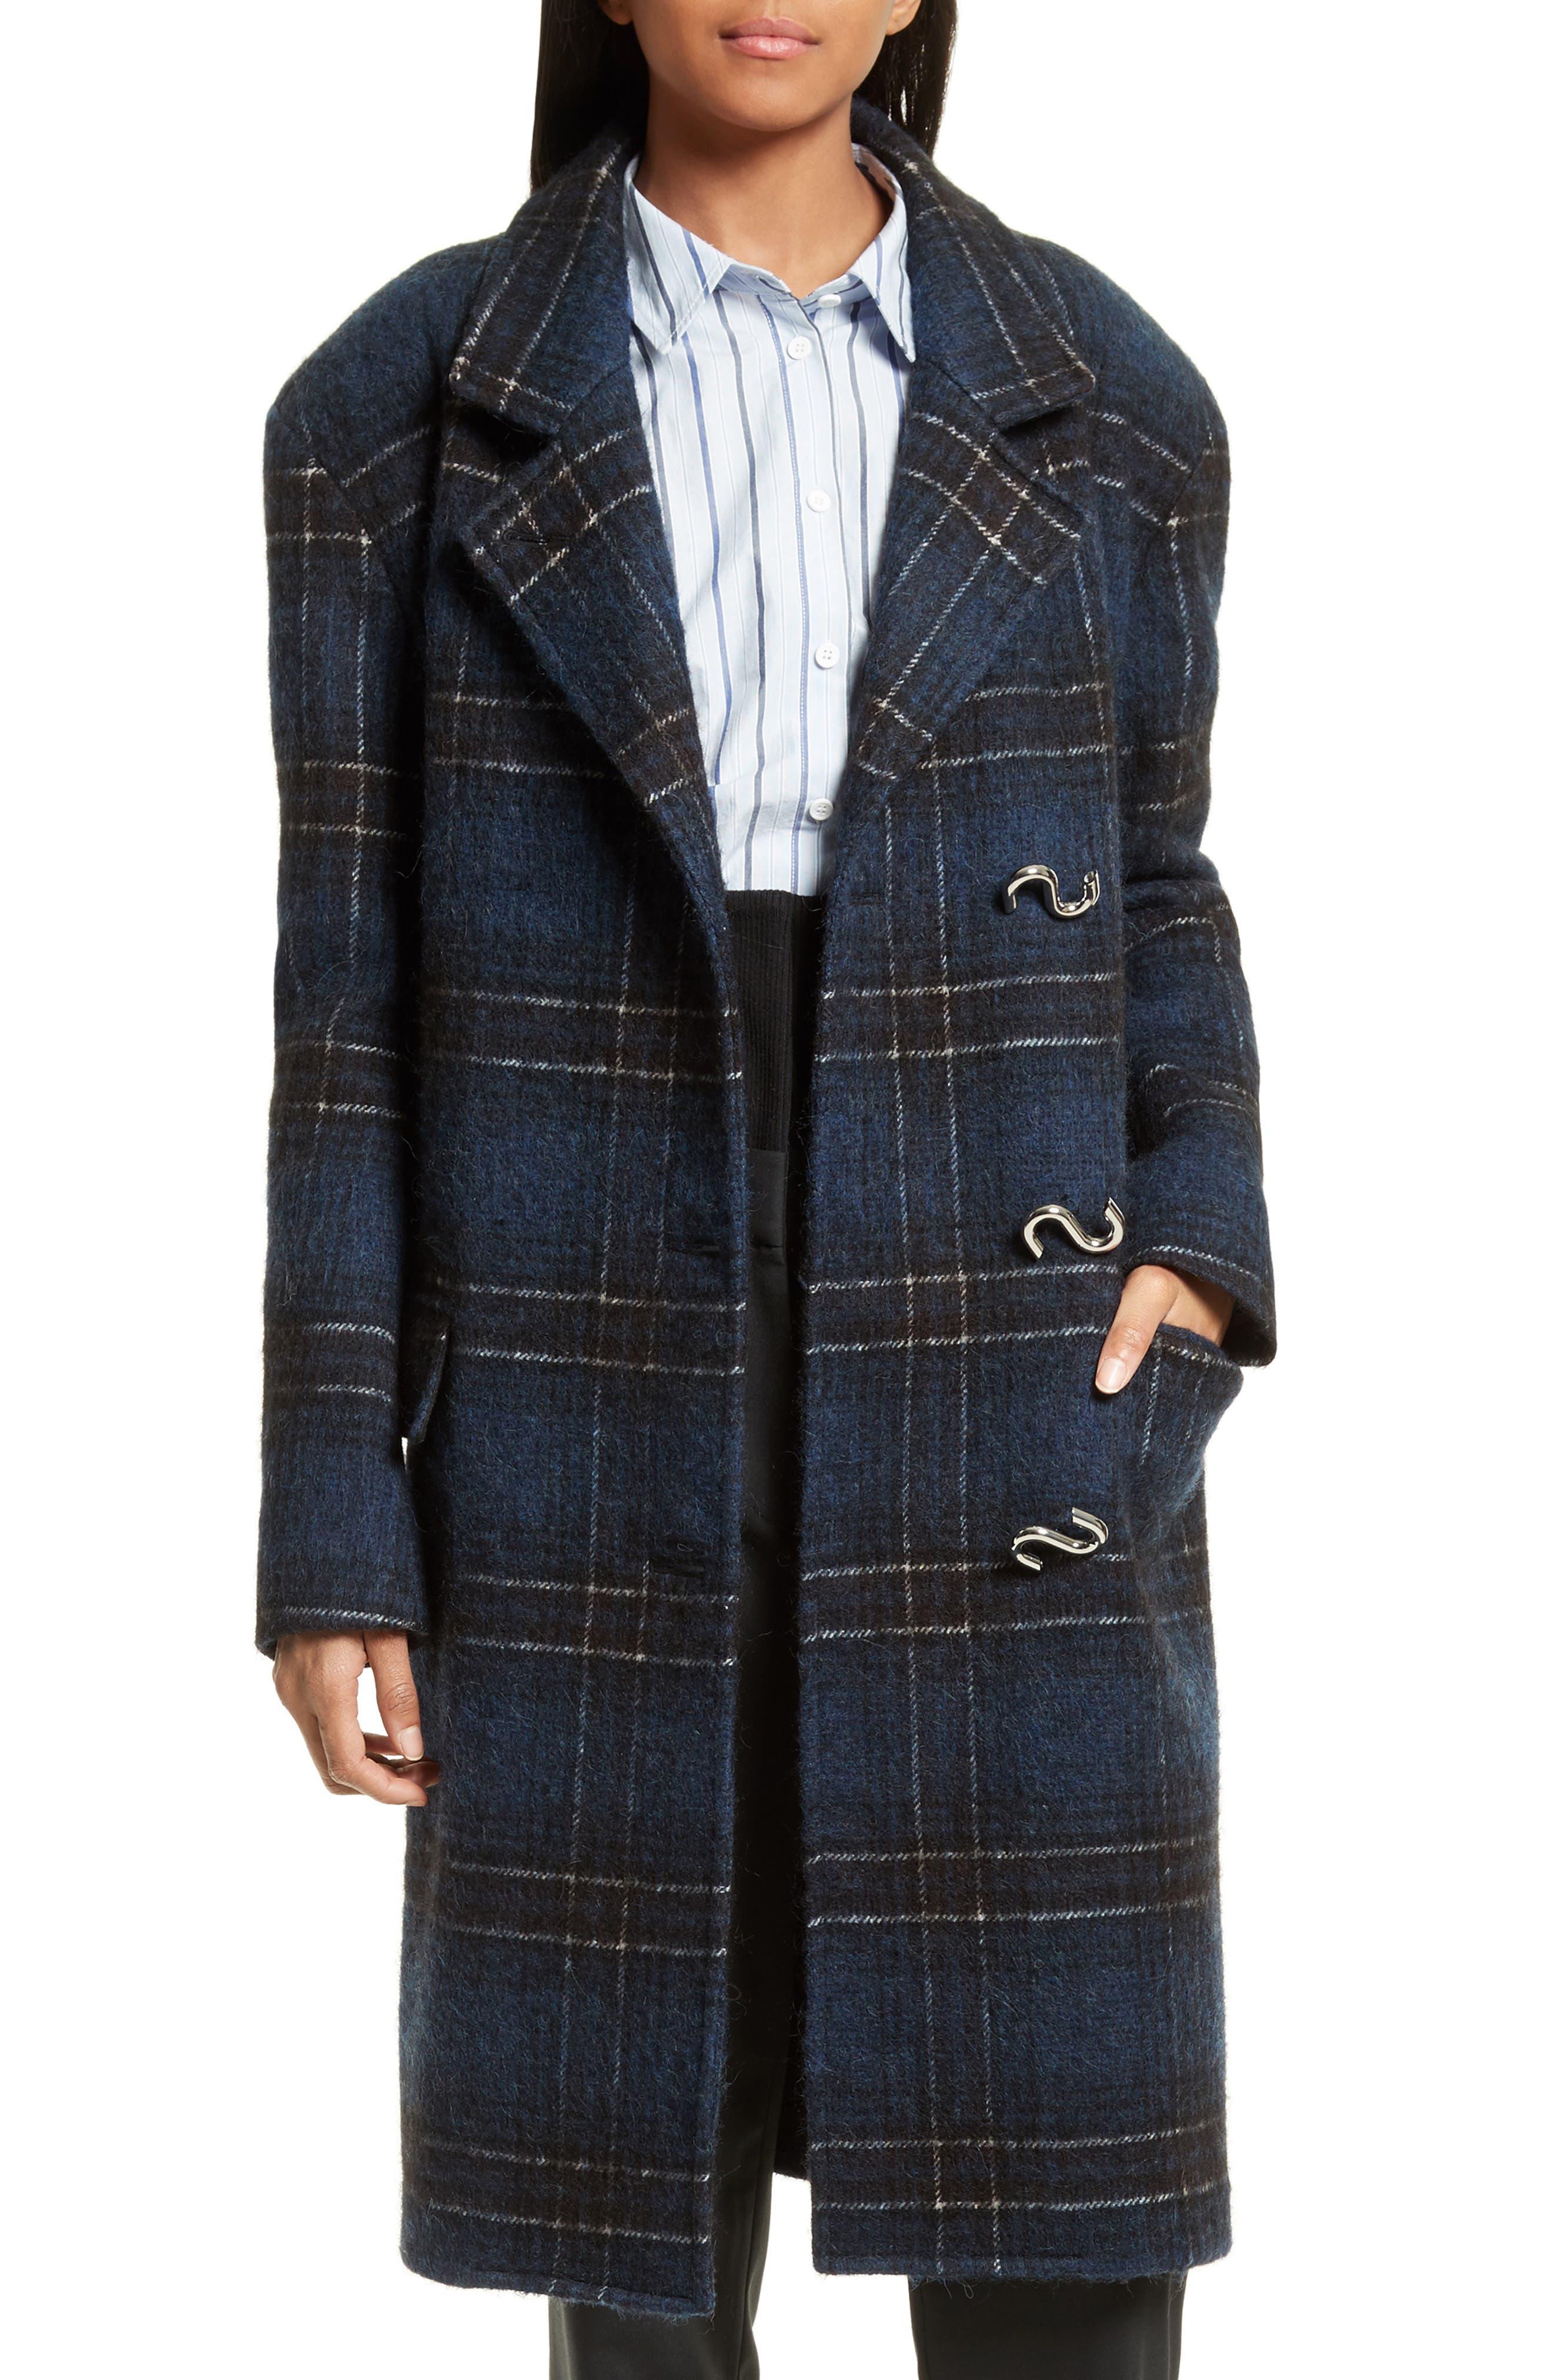 Dominic Plaid Oversize Coat,                         Main,                         color, Navy Multi